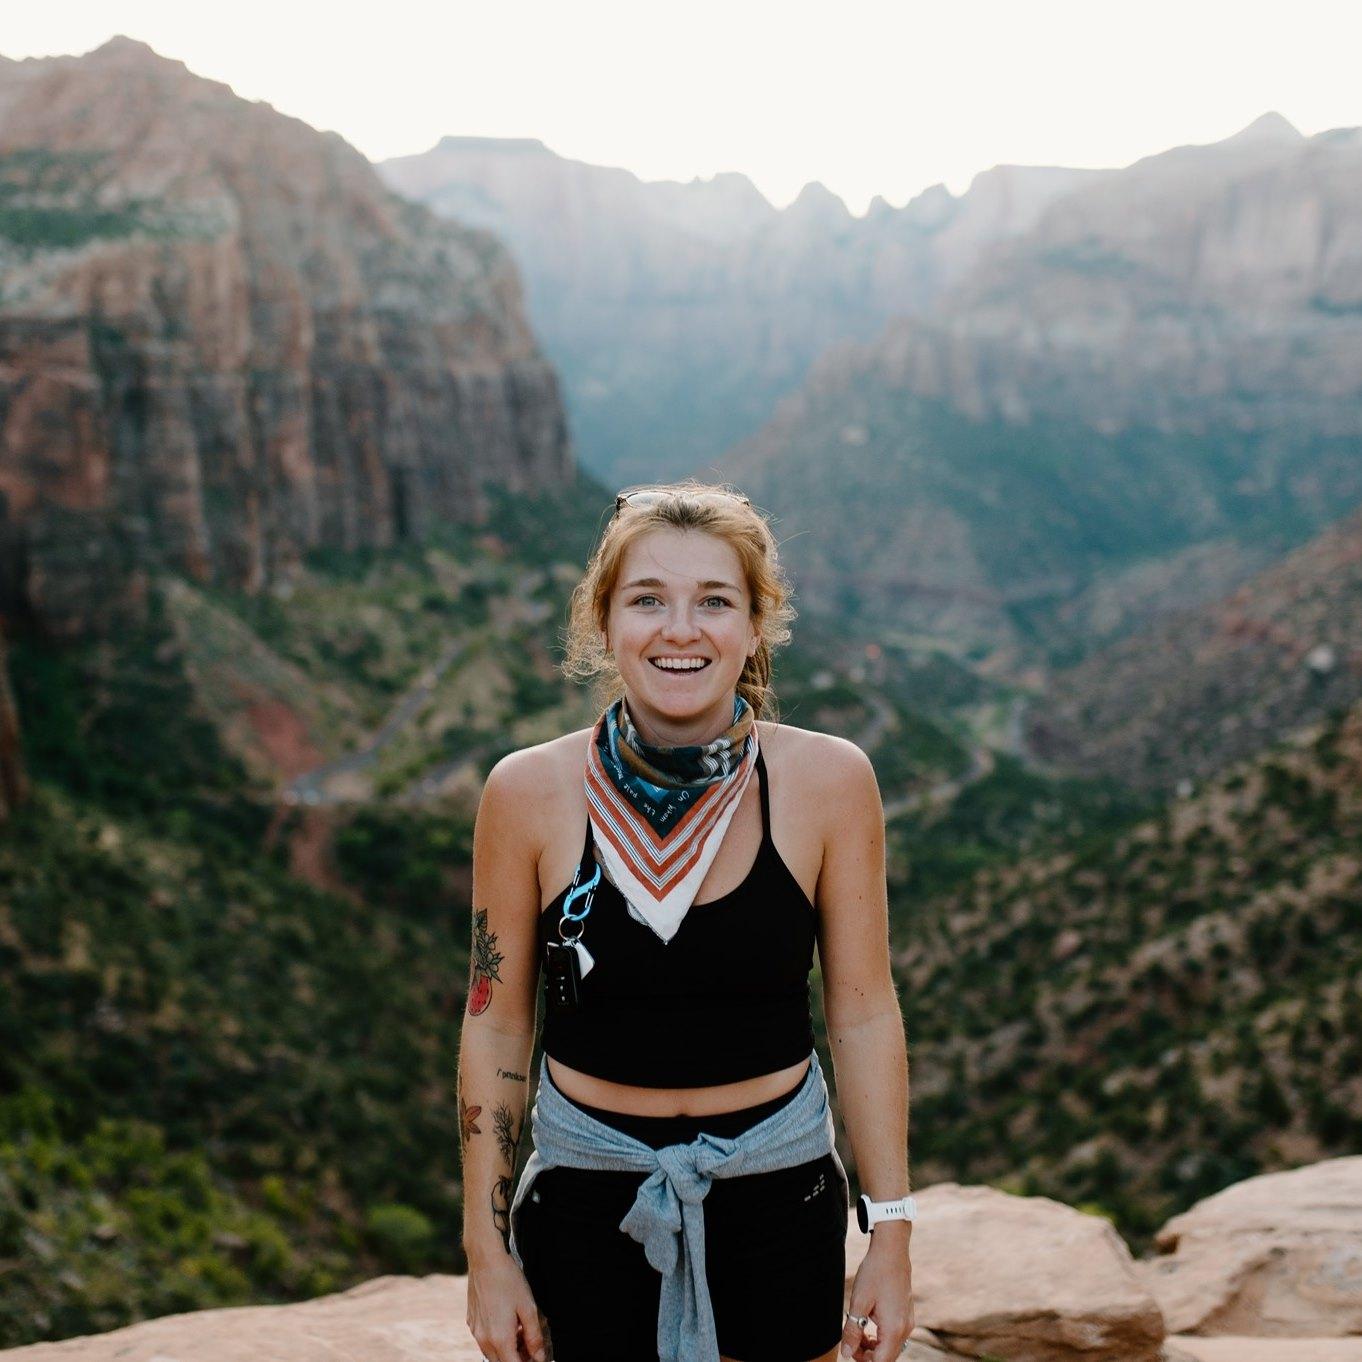 Chloe Matthews